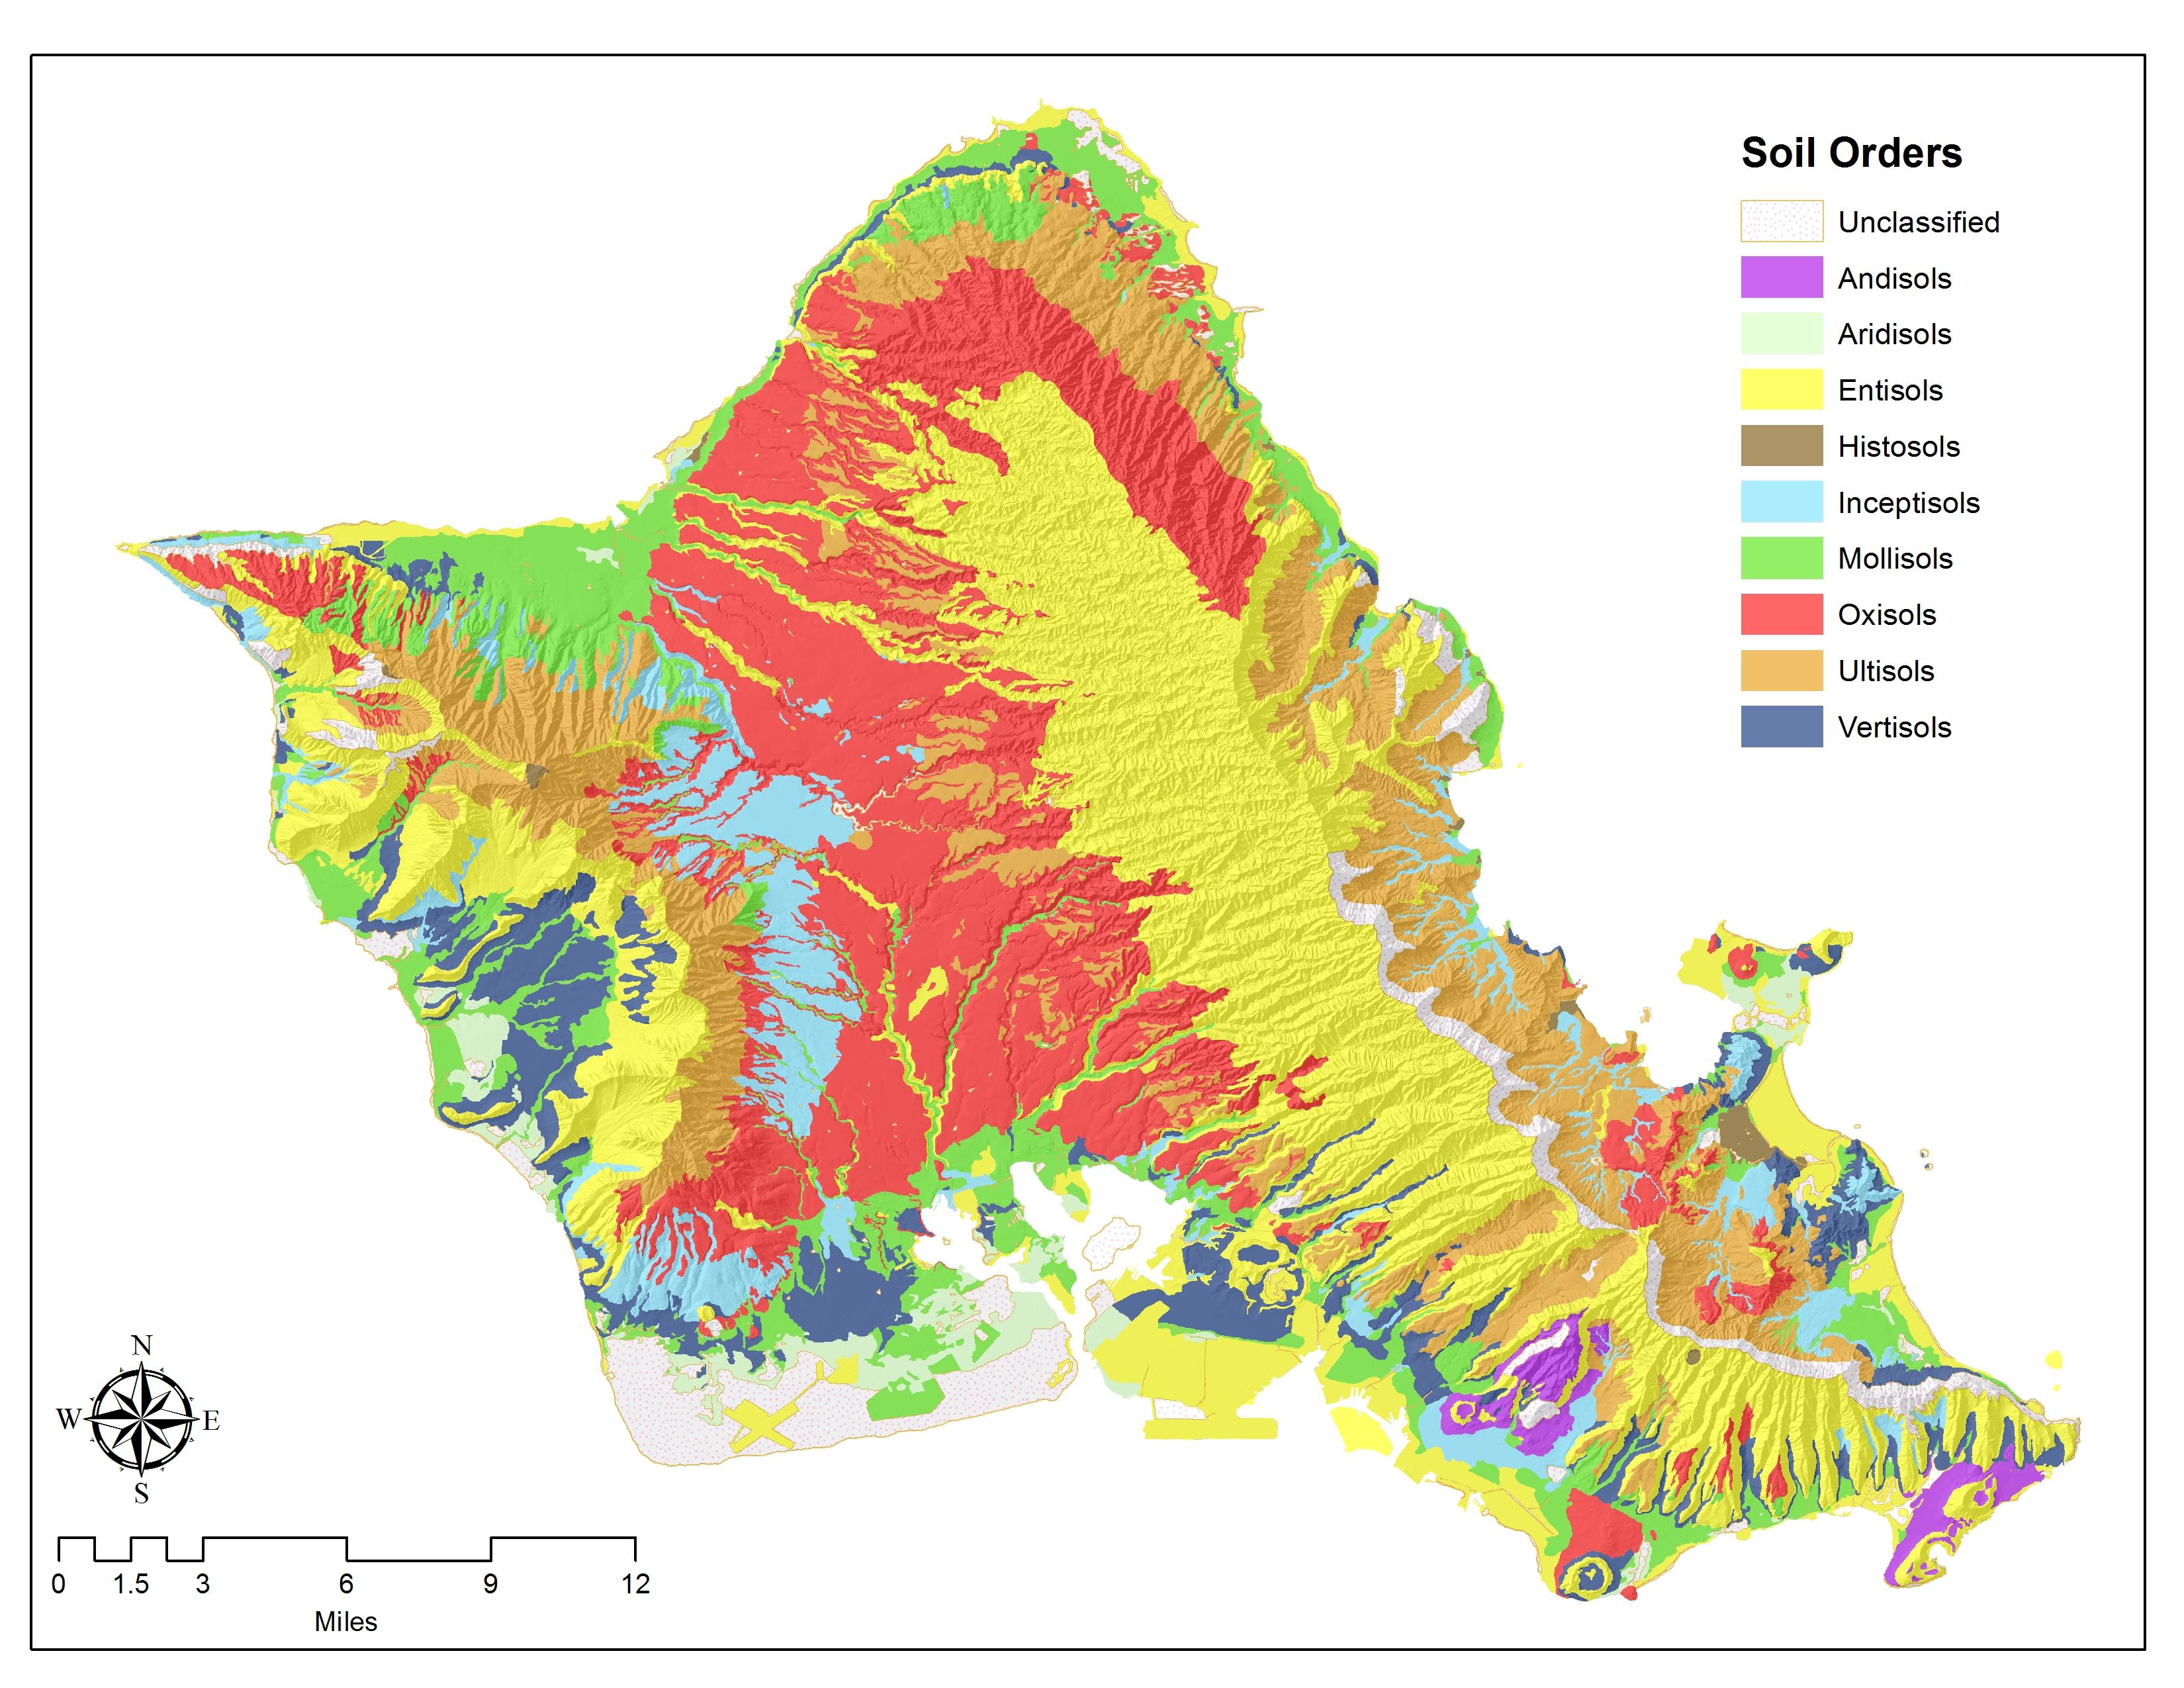 Soil map my blog for Soil web survey